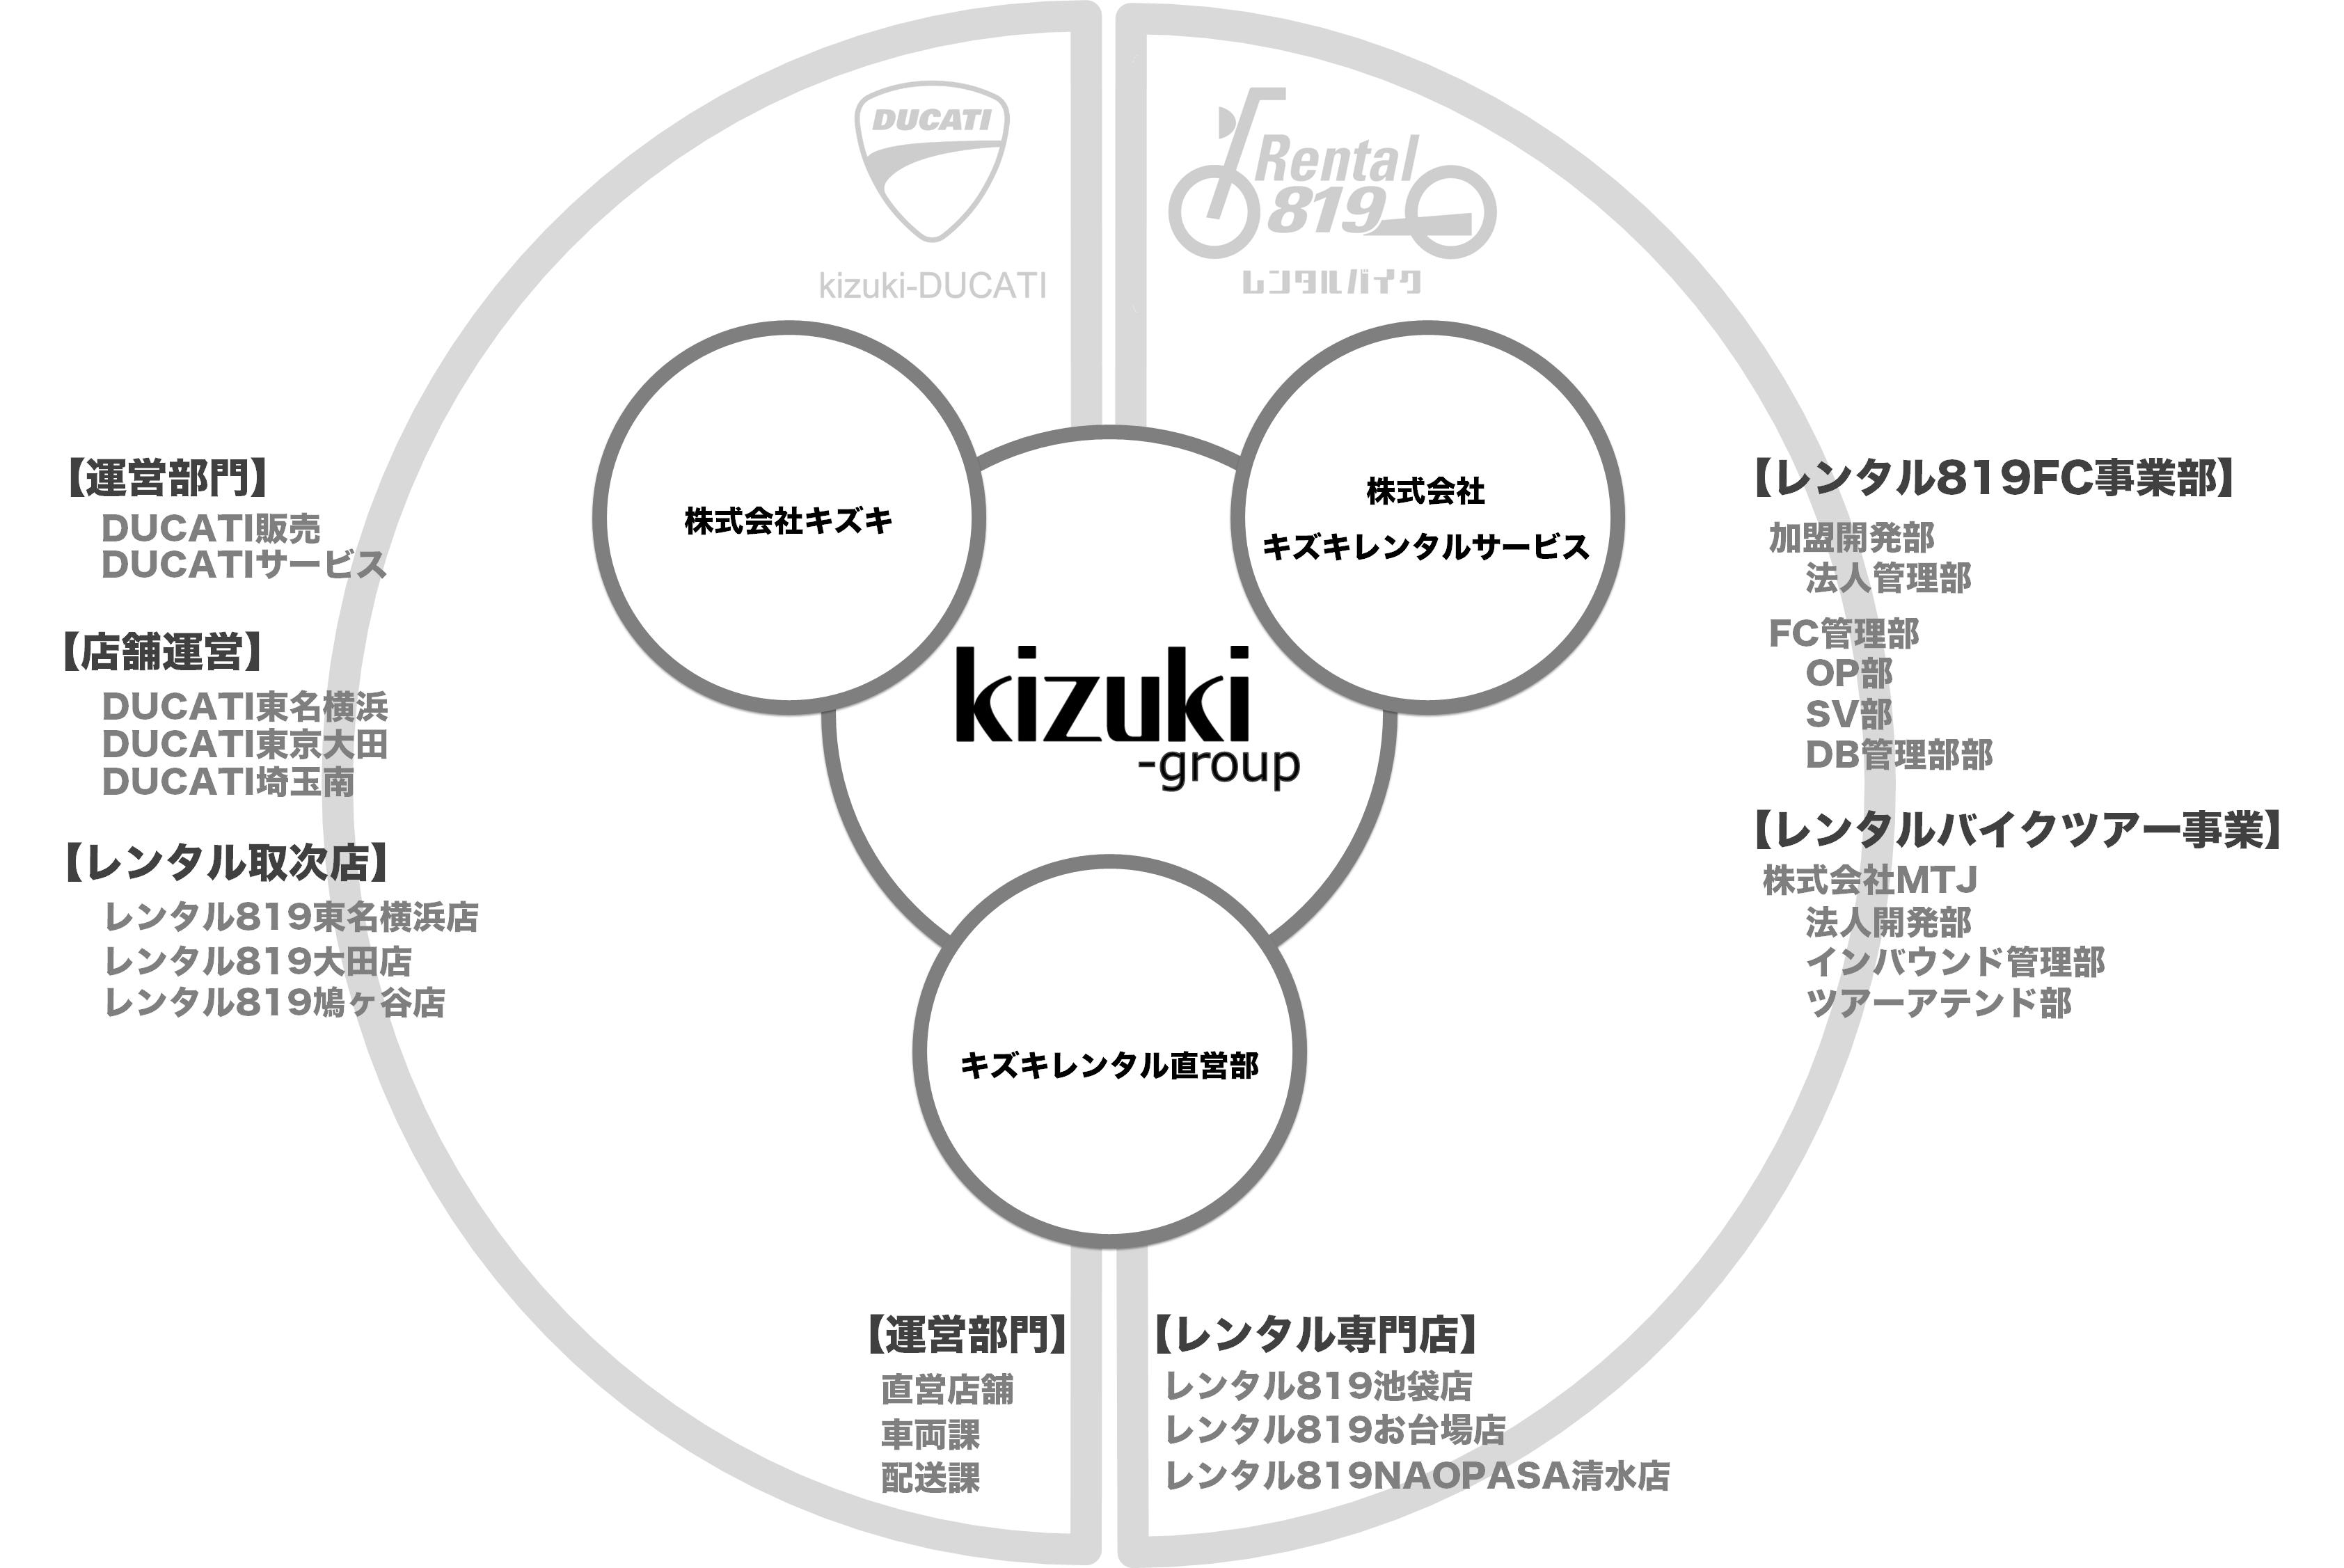 kizuki-grp体系図